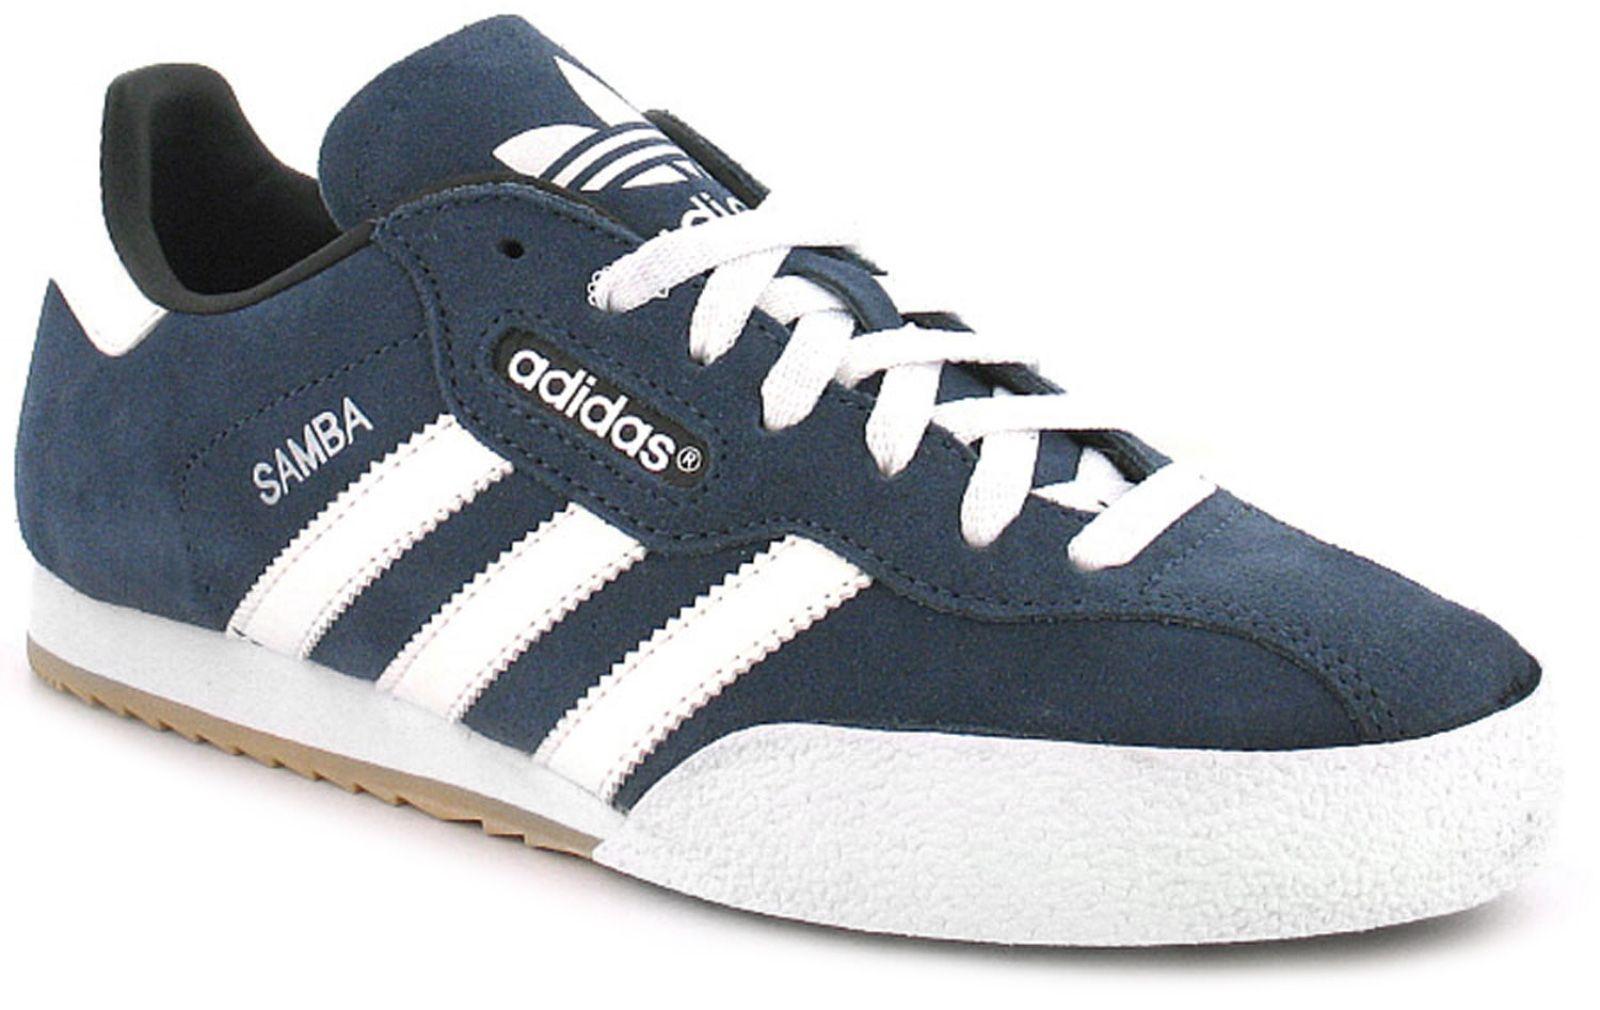 ADIDAS SAMBA SUPER in Pelle Scamosciata Indoor Soccer Shoes Sneaker UK